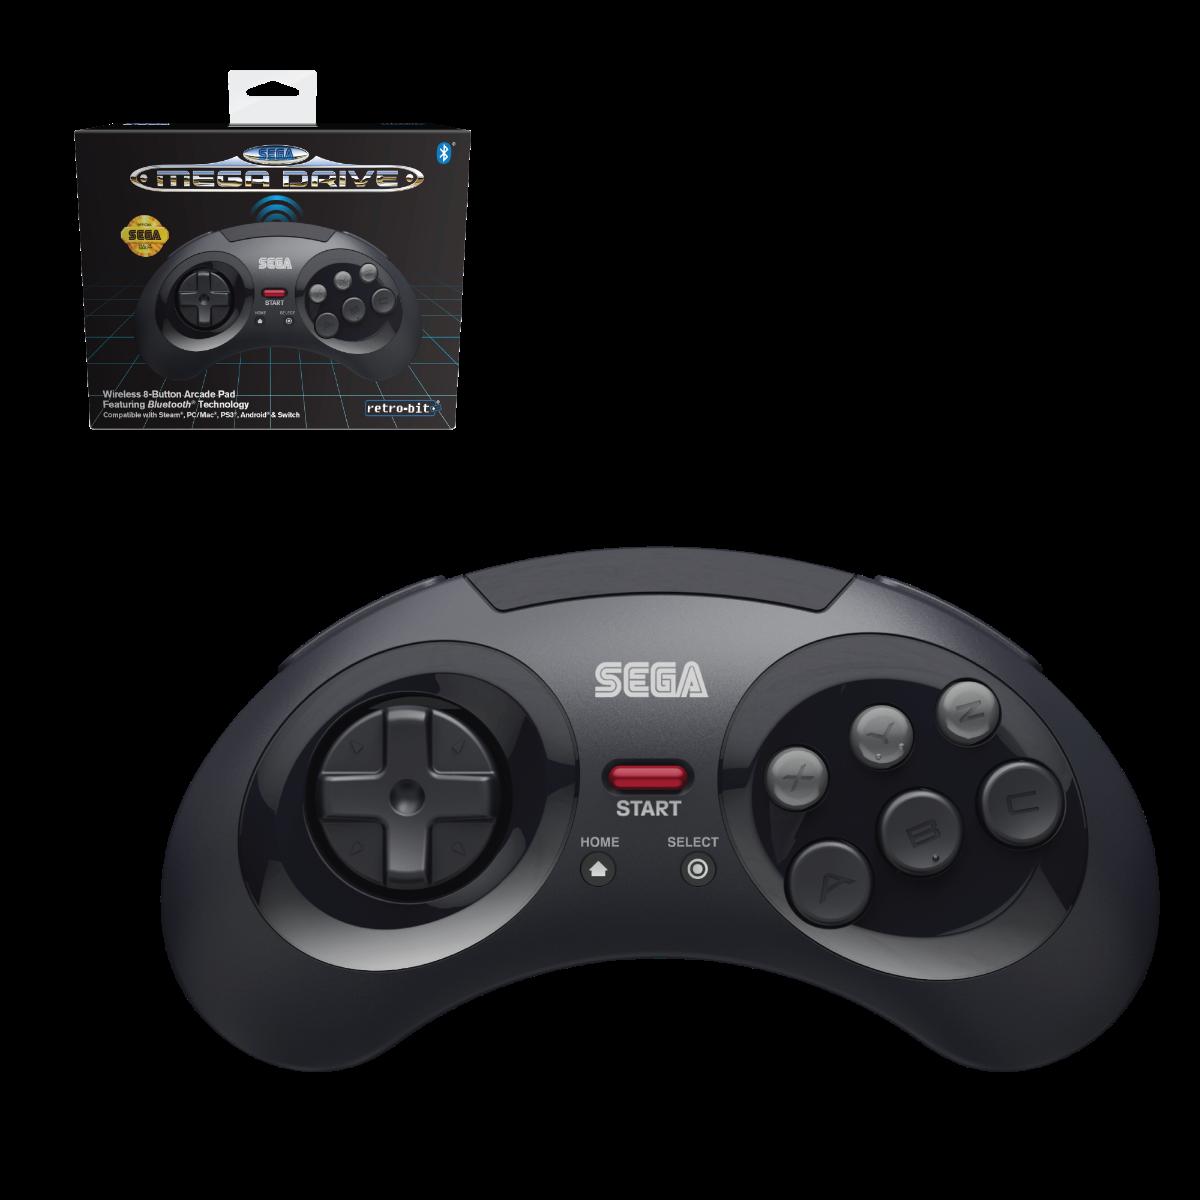 SEGA, Mega Drive, 8-Button, Arcade Pad, wireless, Bluetooth, Black